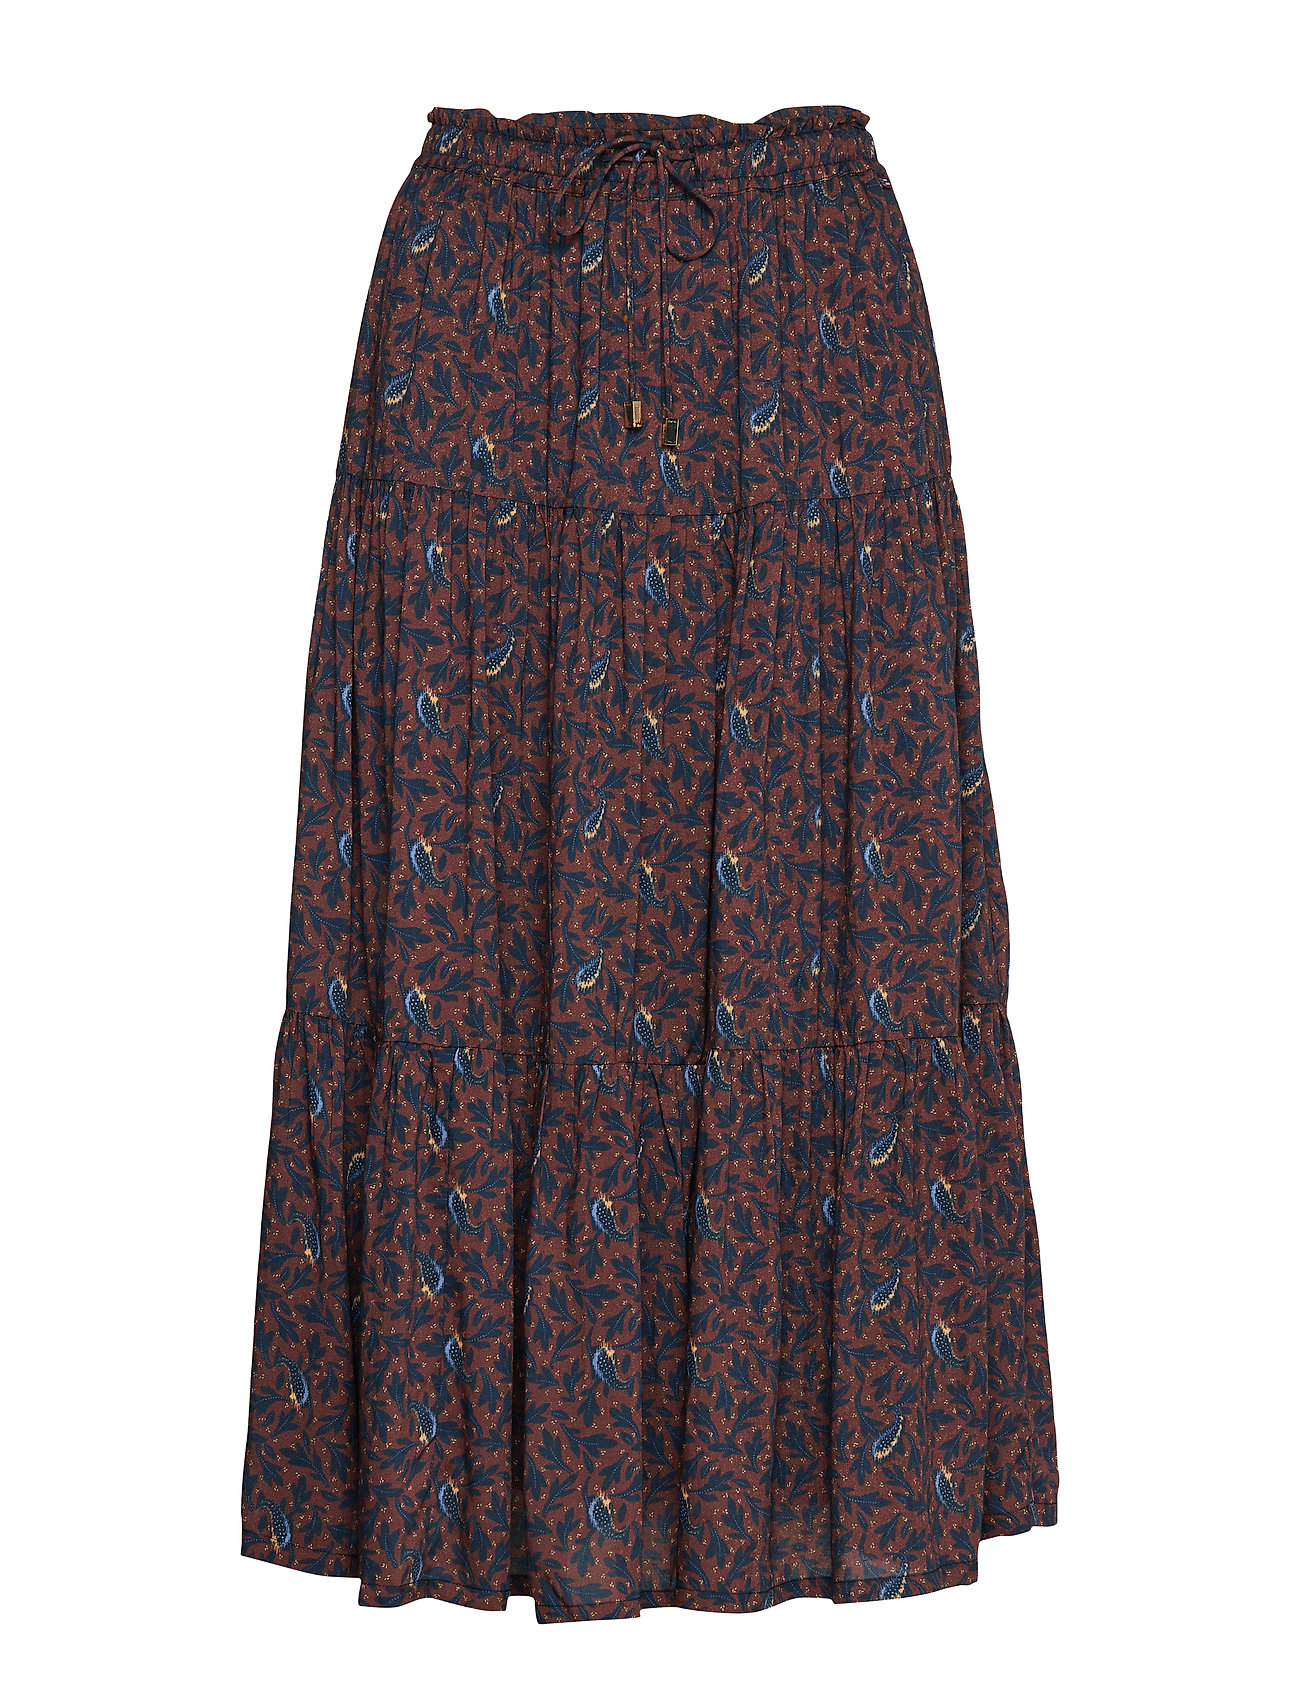 Lexington Clothing Evelyn Skirt - FEATHER PRINT